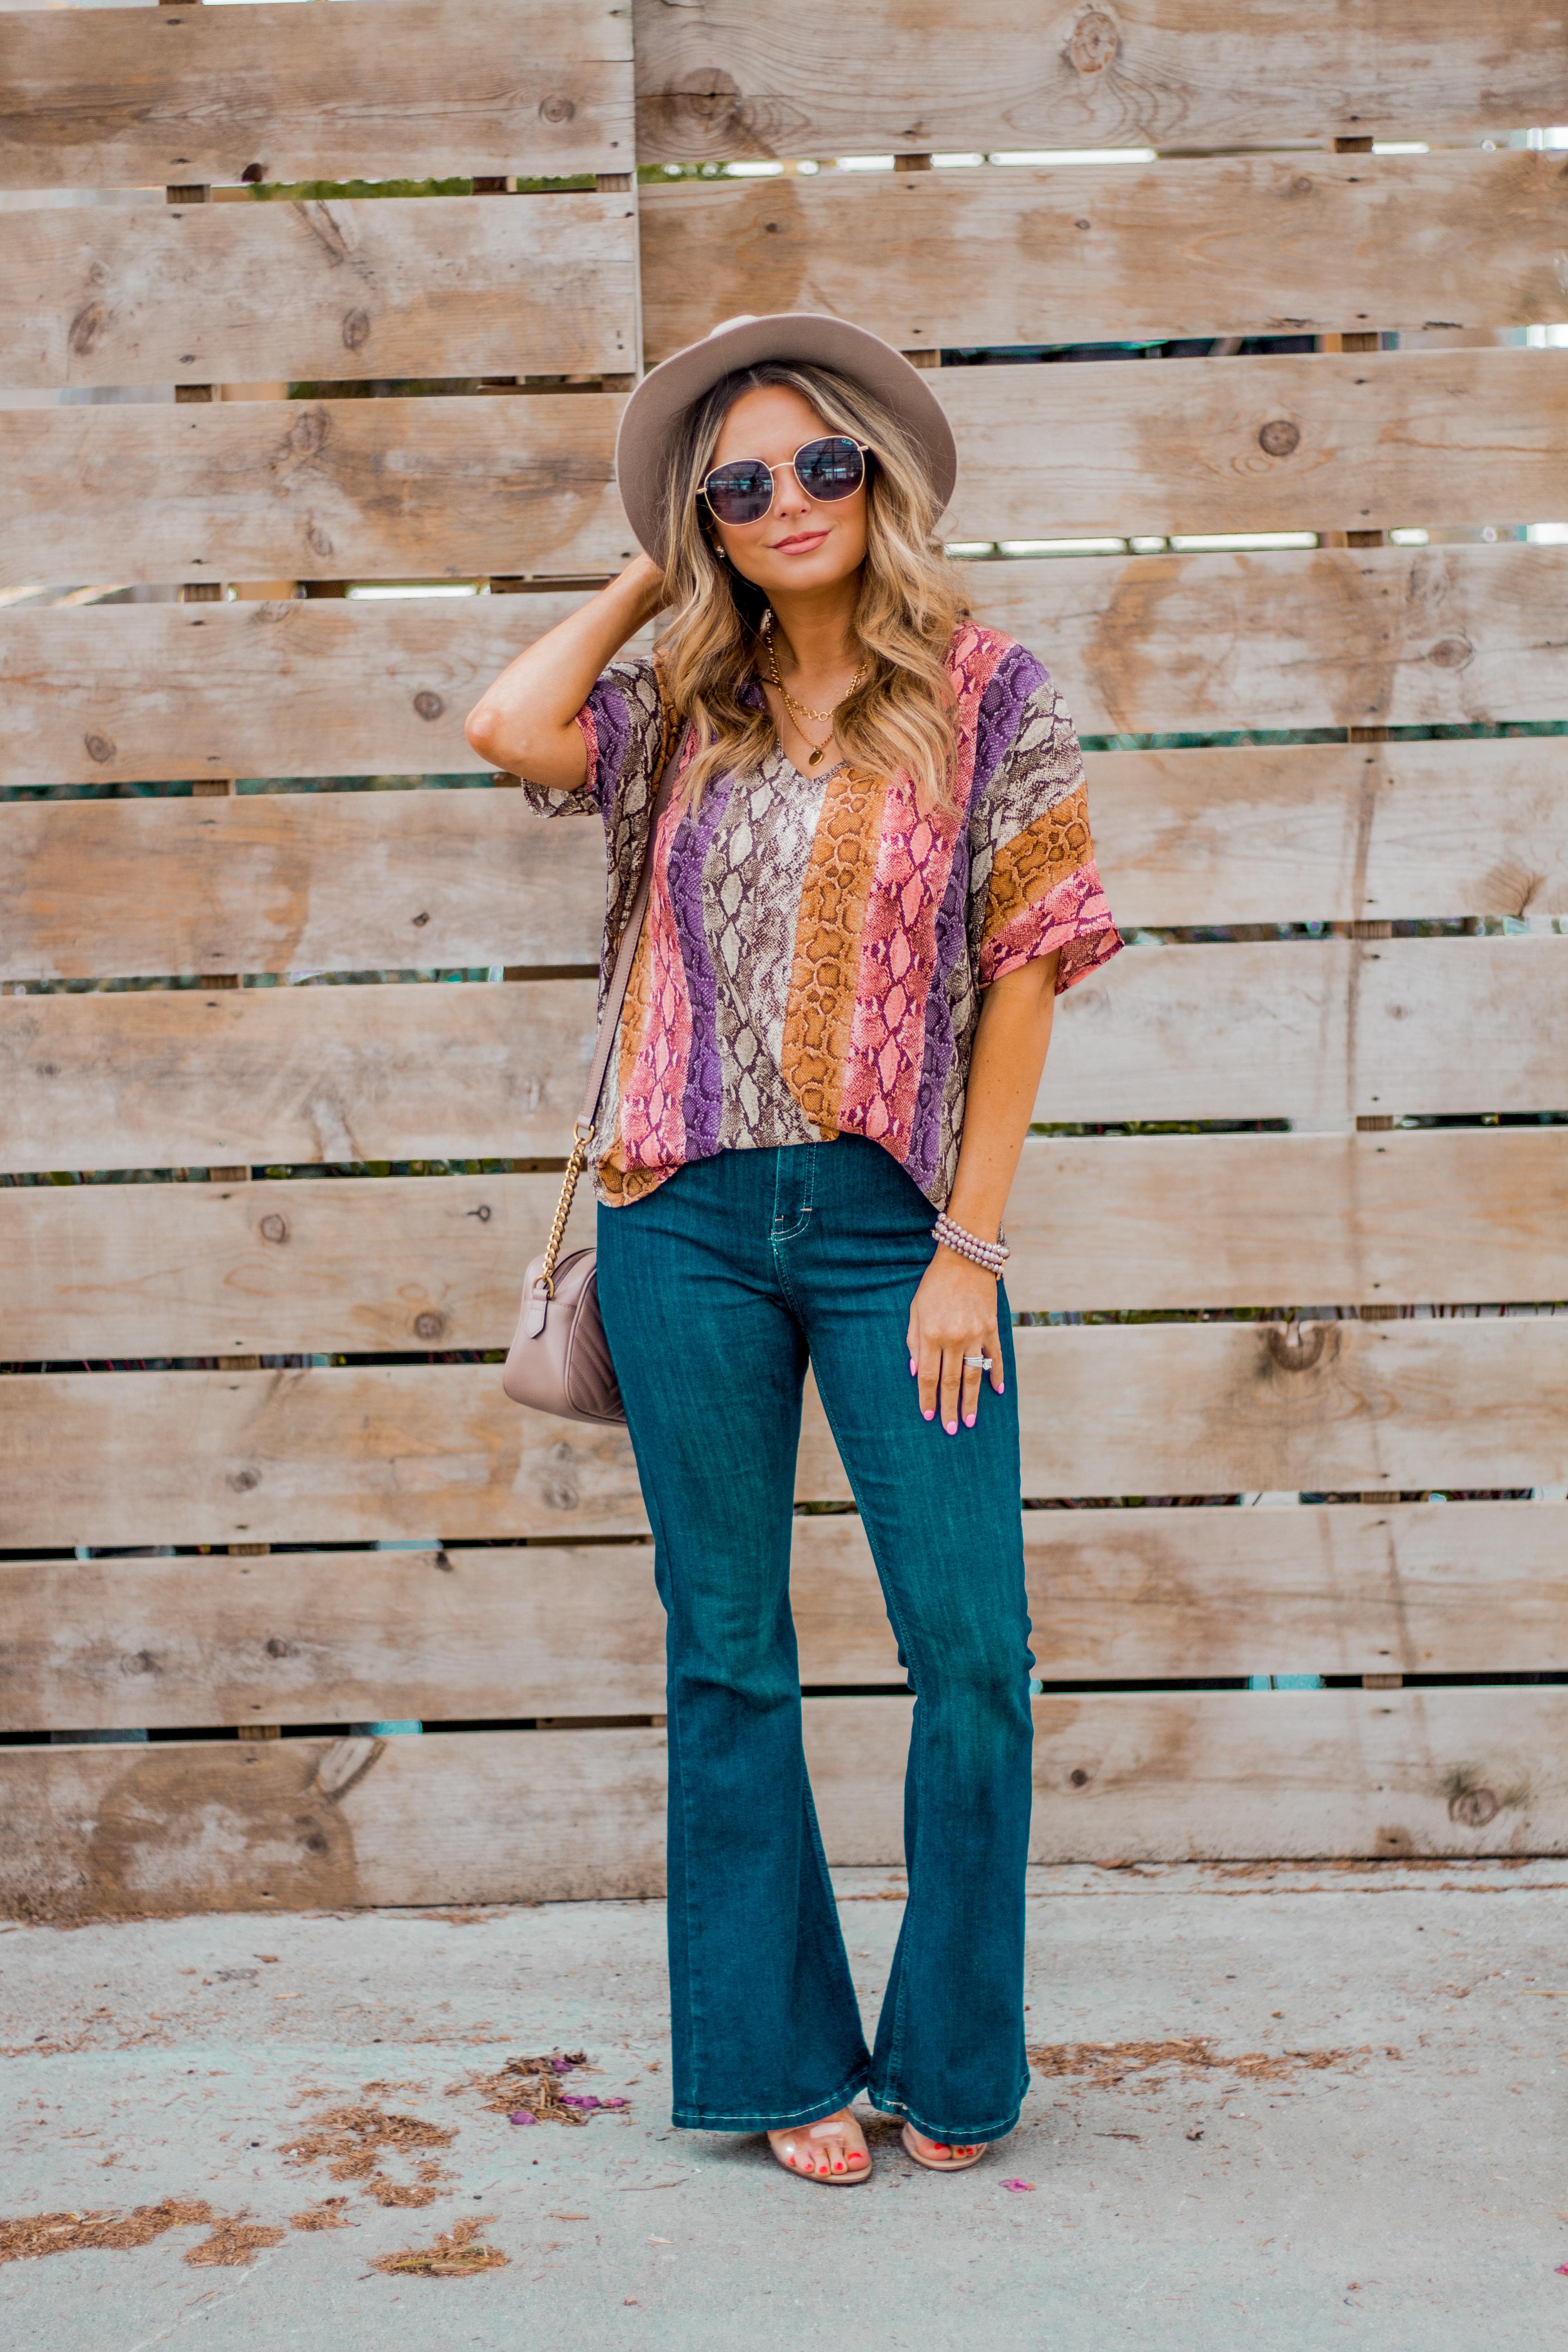 Women's Fashion - Snakeskin Print - Snakeskin Trend - Spring Fashion Trend - Omaha Fashion Blog - Boho Vibes - Flare Jeans - 14